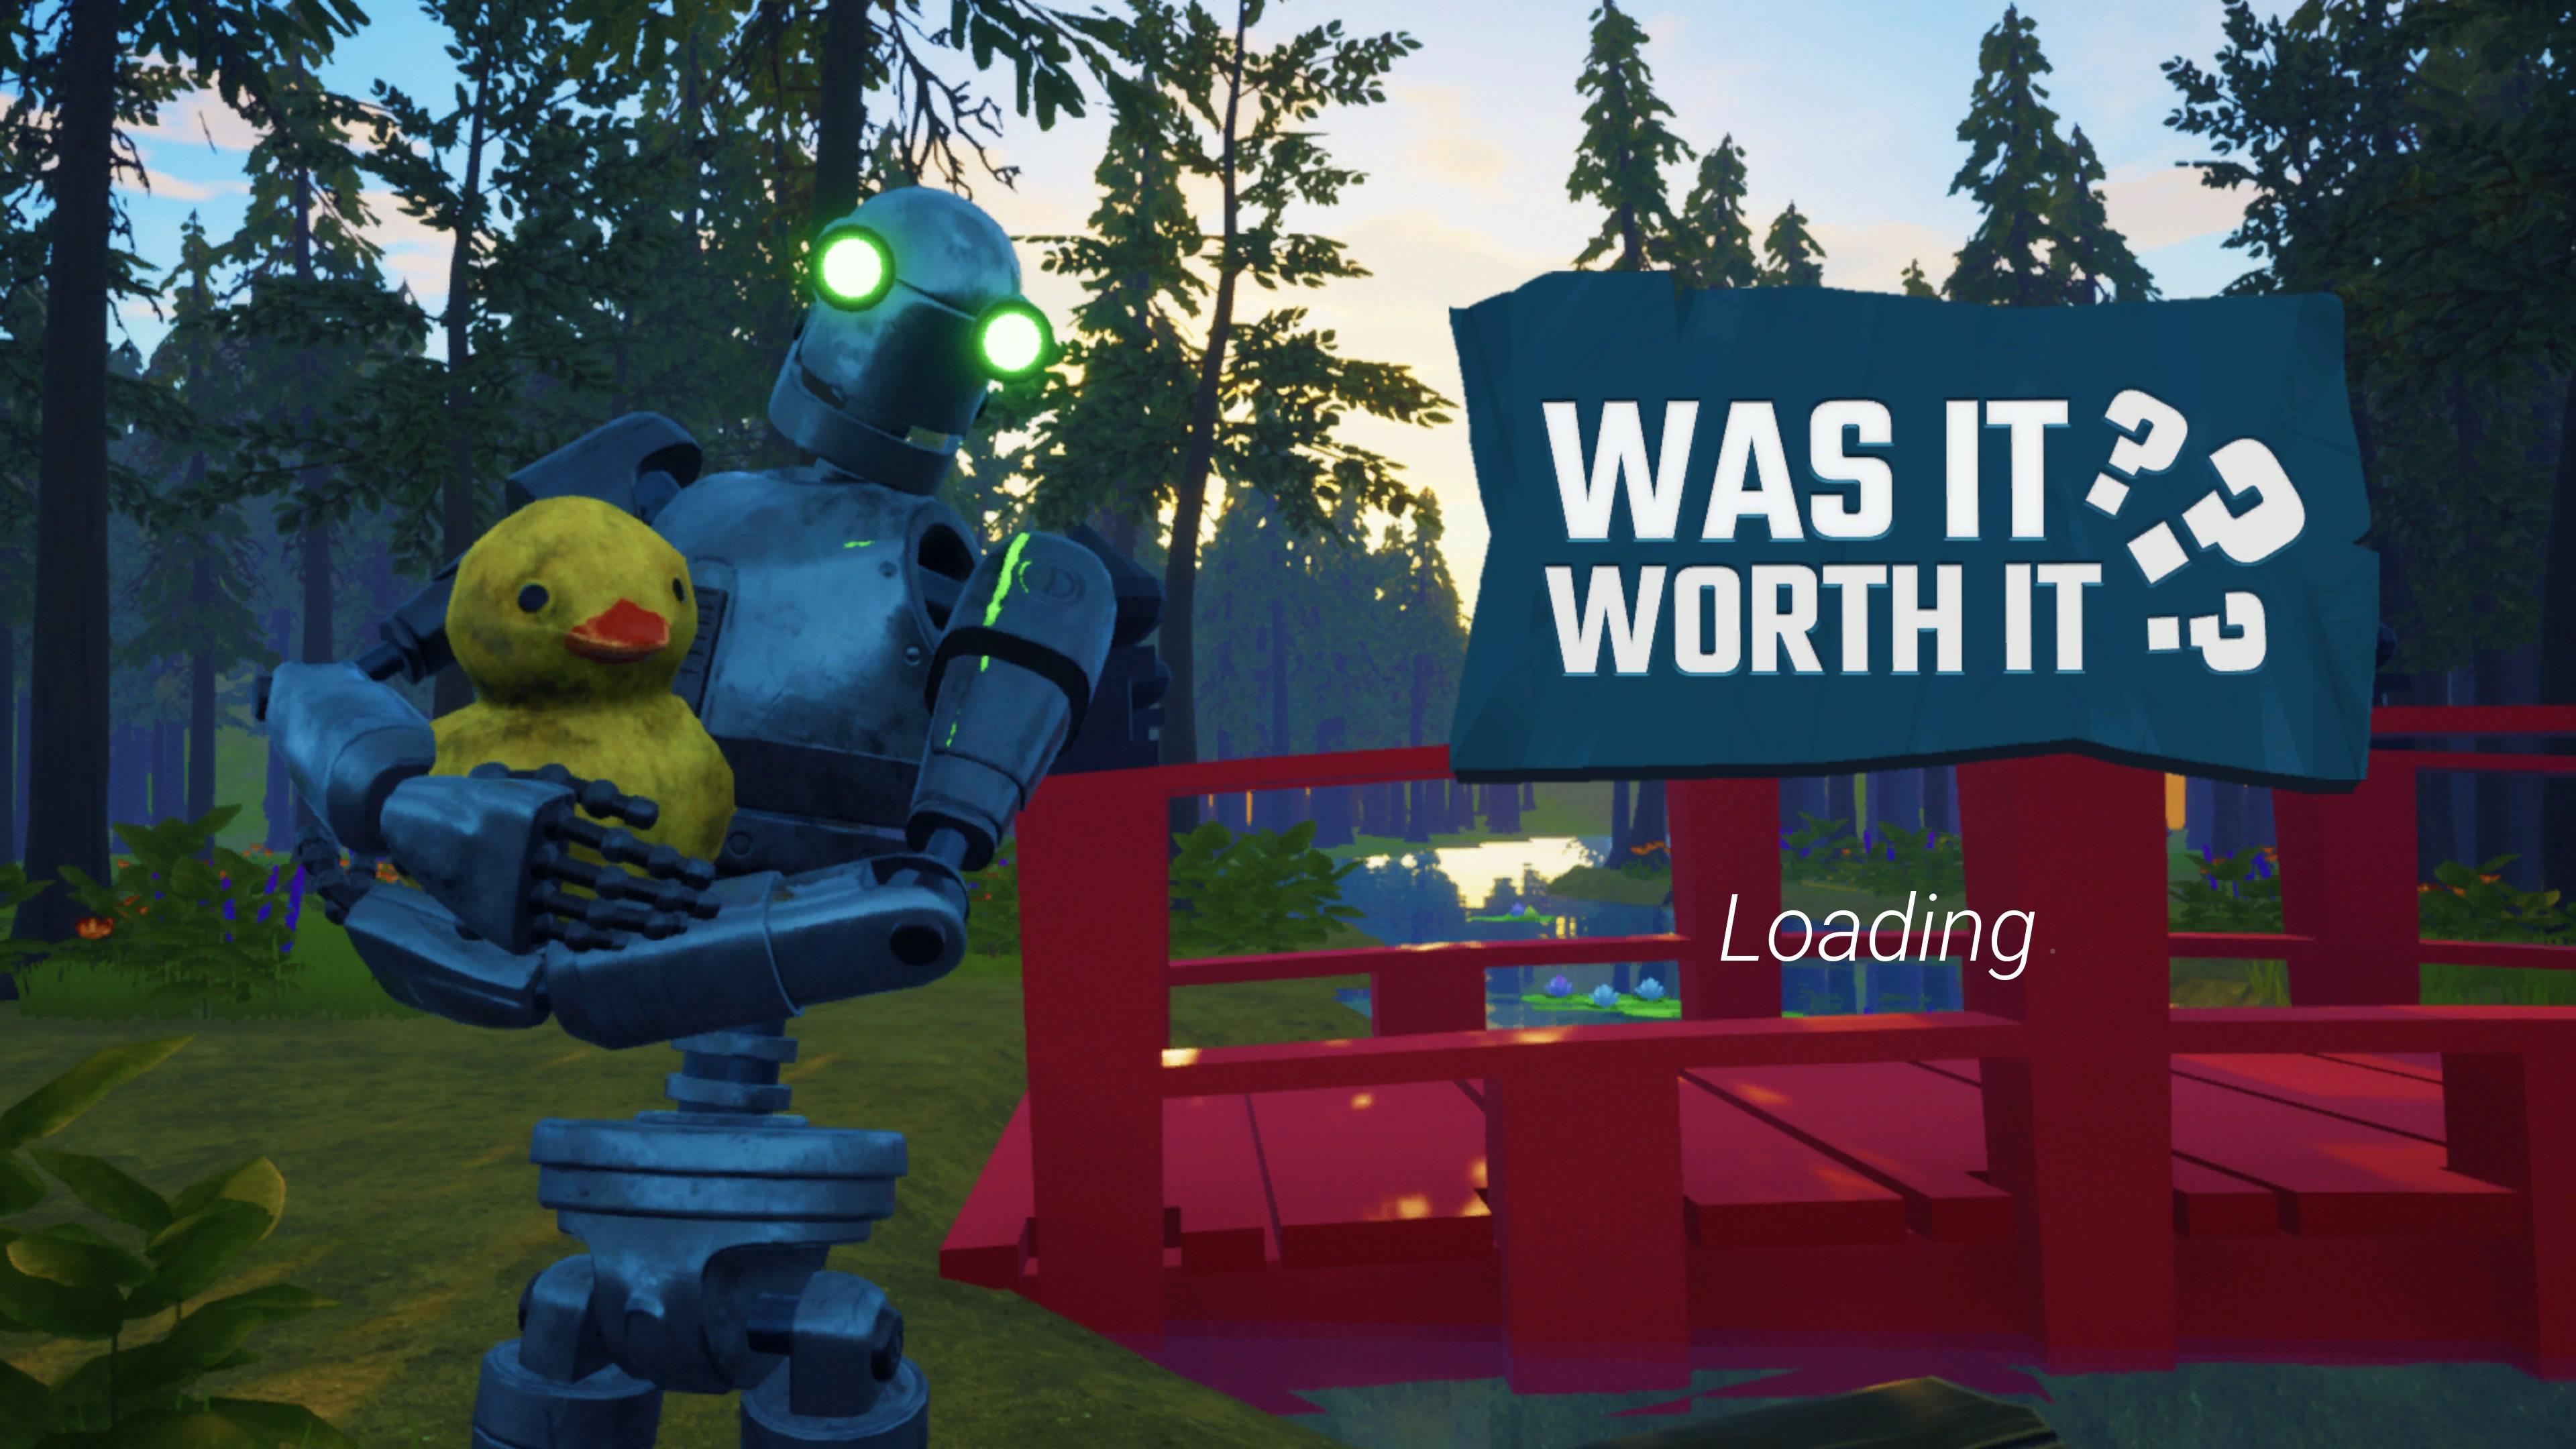 Was It Worth It  game screenshot.